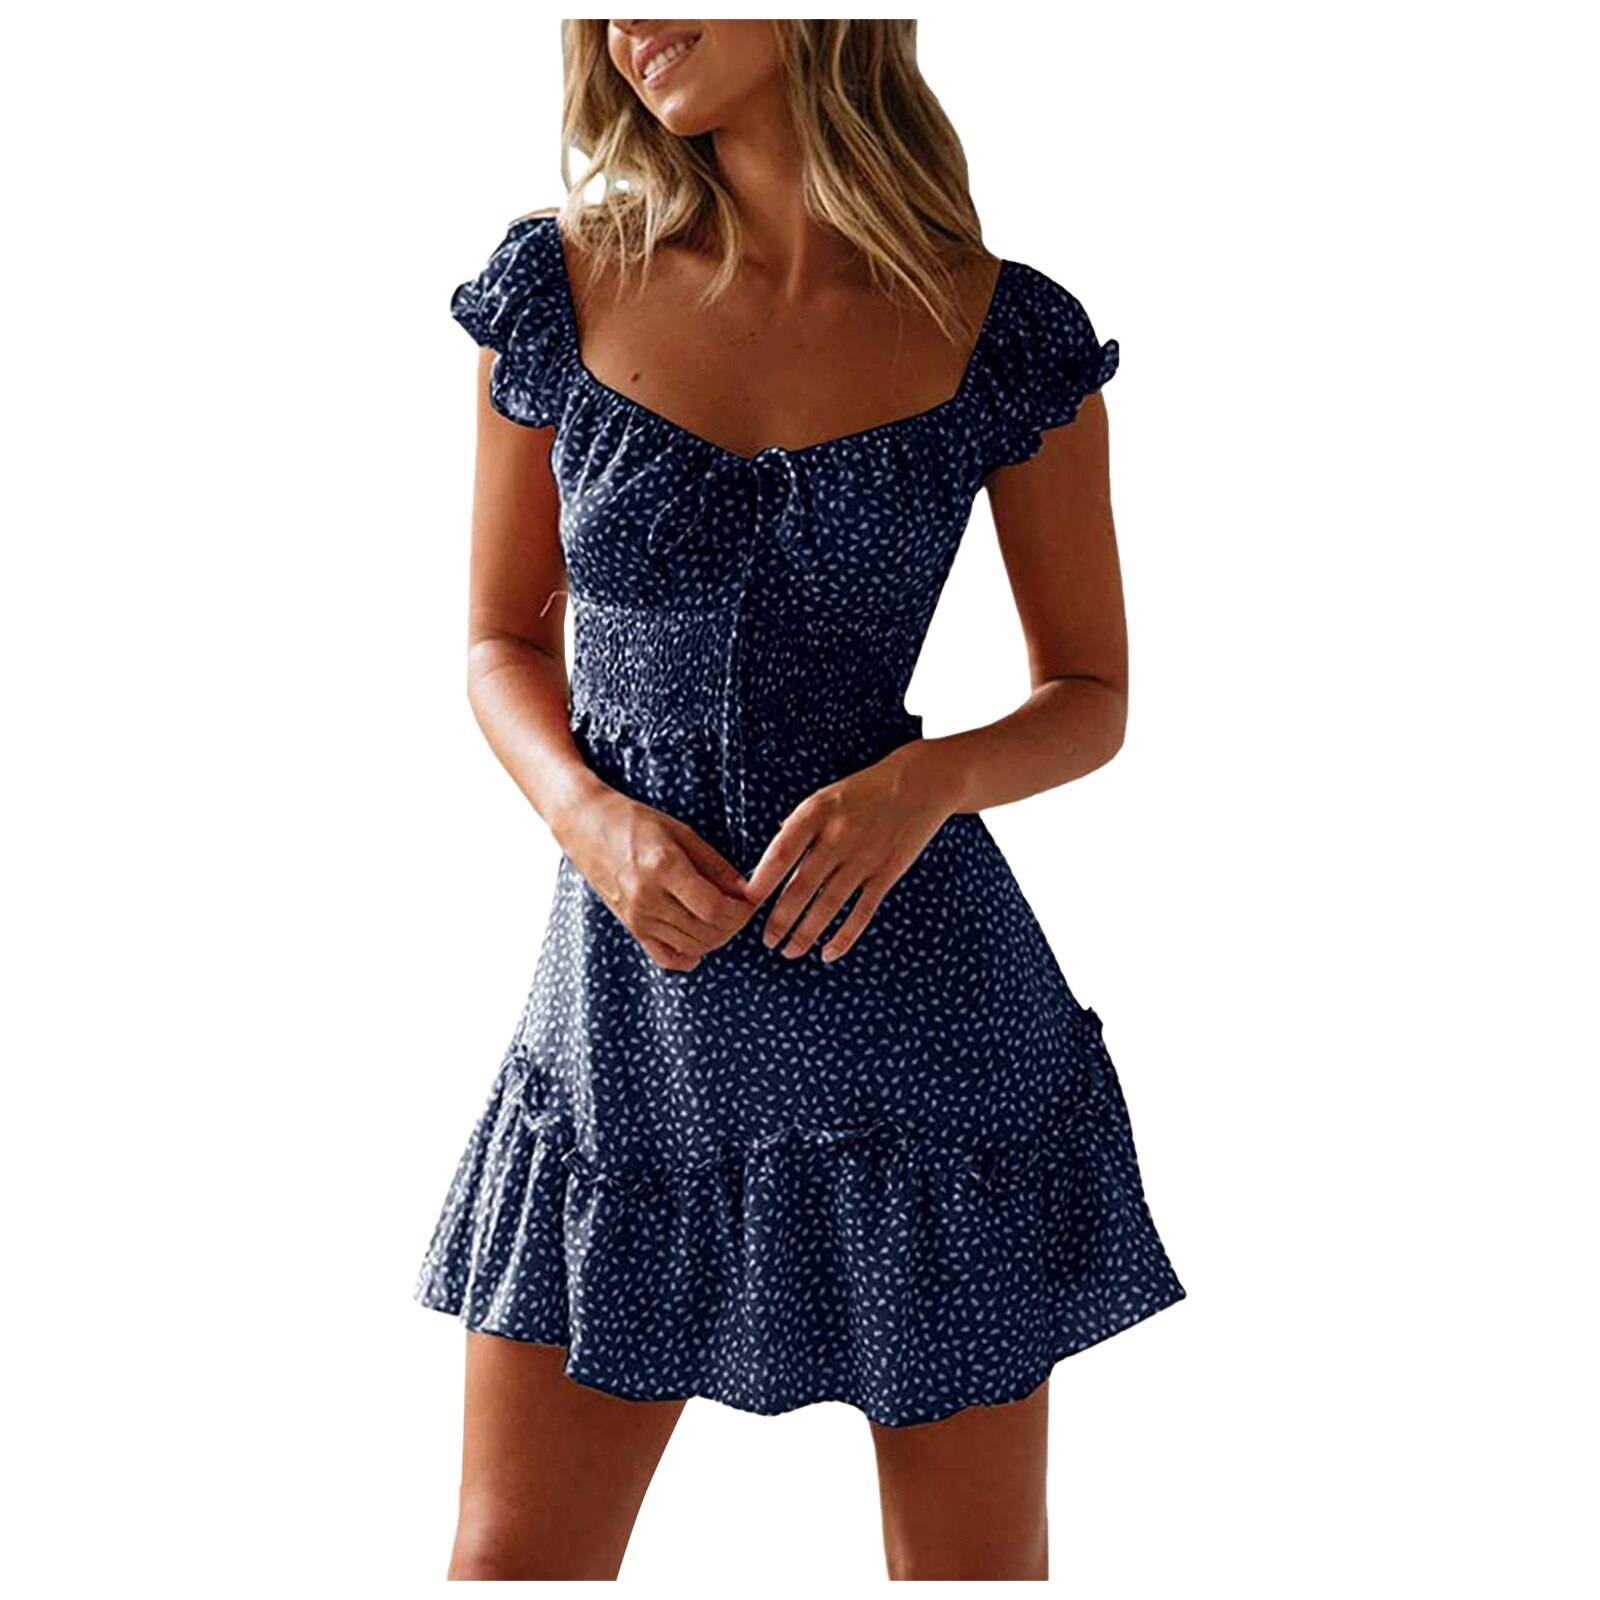 2021 Summer Women Pencil Dress Pleated Dots Elegant Dresses Sexy Skinny Evening...